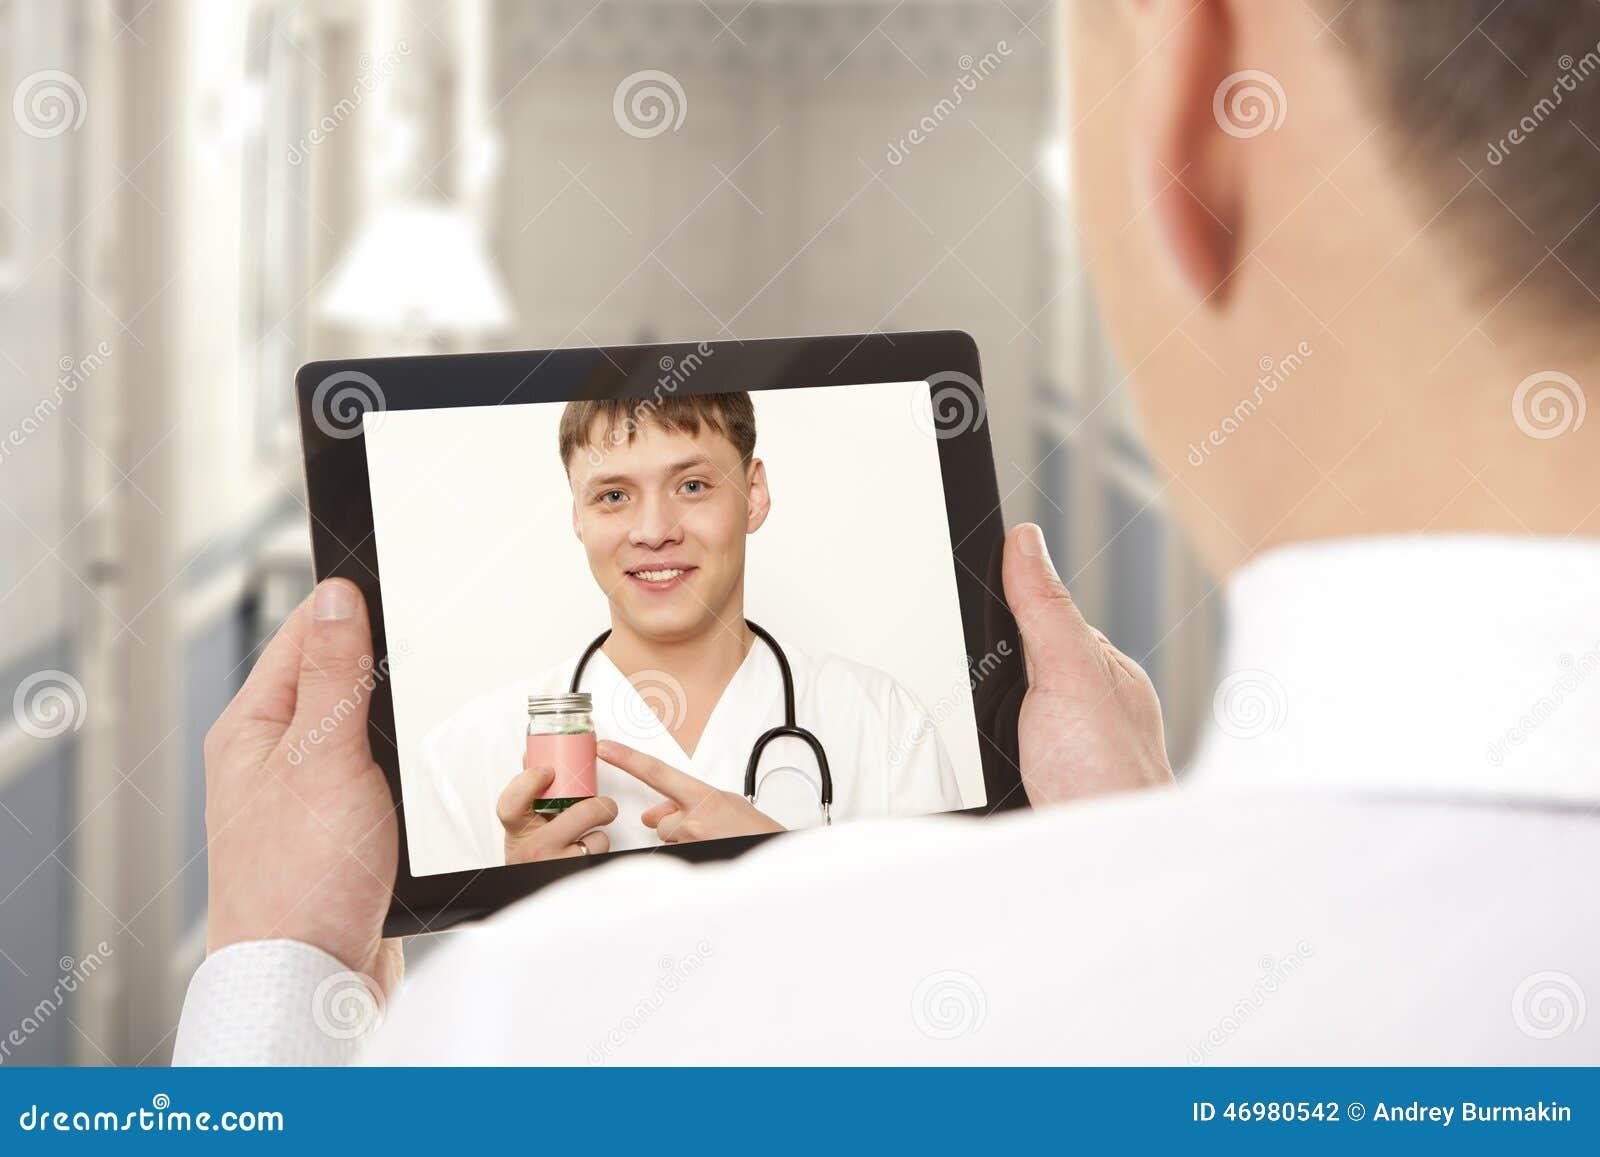 free online personals in doctors inlet 100% free online dating in aiken 1,500,000 daily active members.